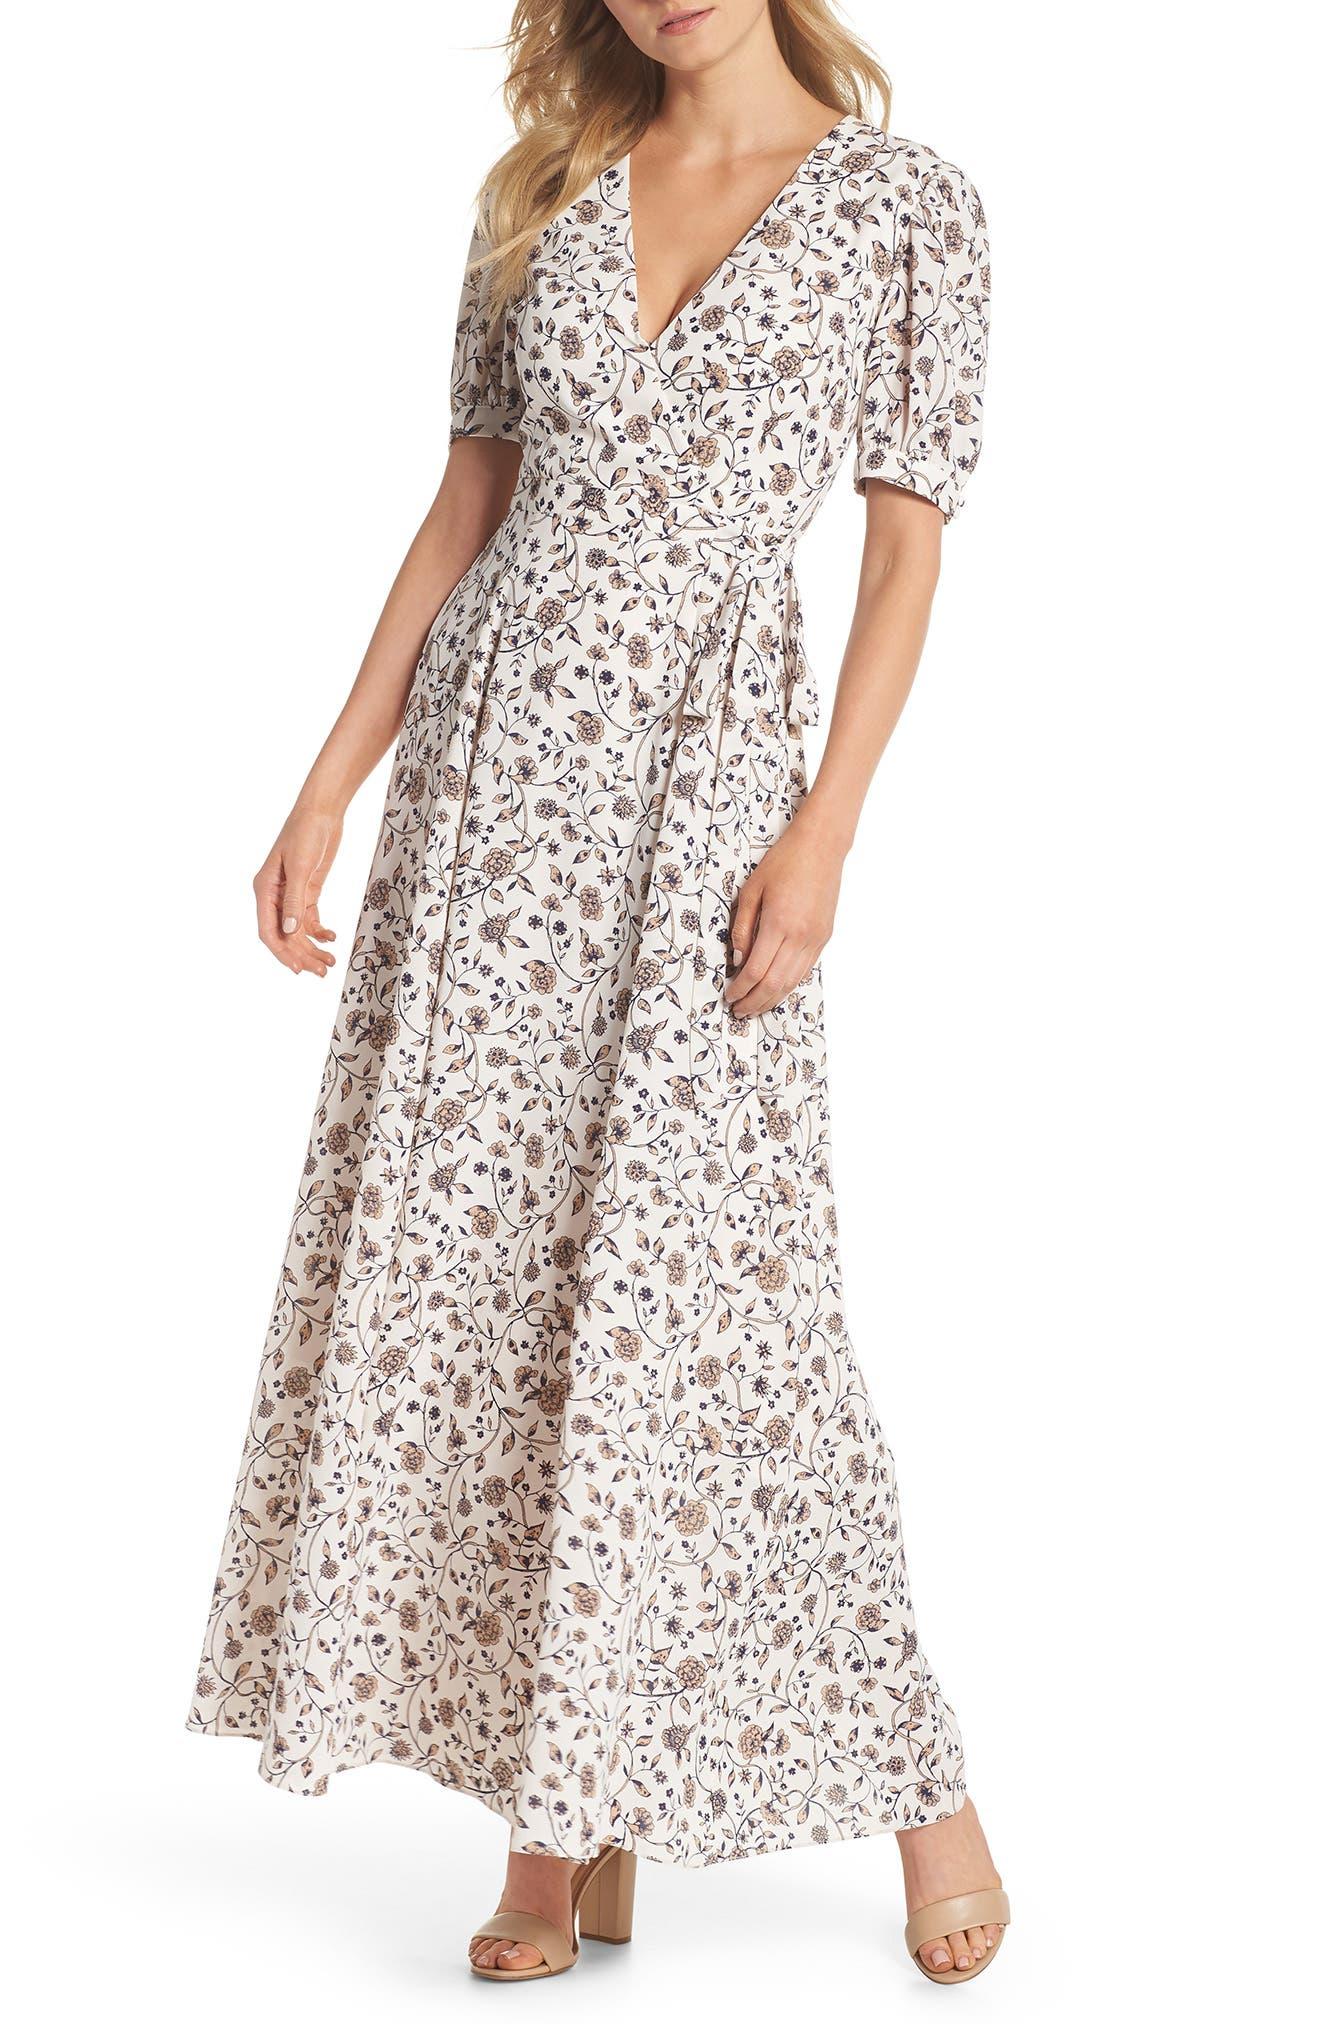 Gal Meets Glam Collection Millie Floral Faux Wrap Maxi Dress